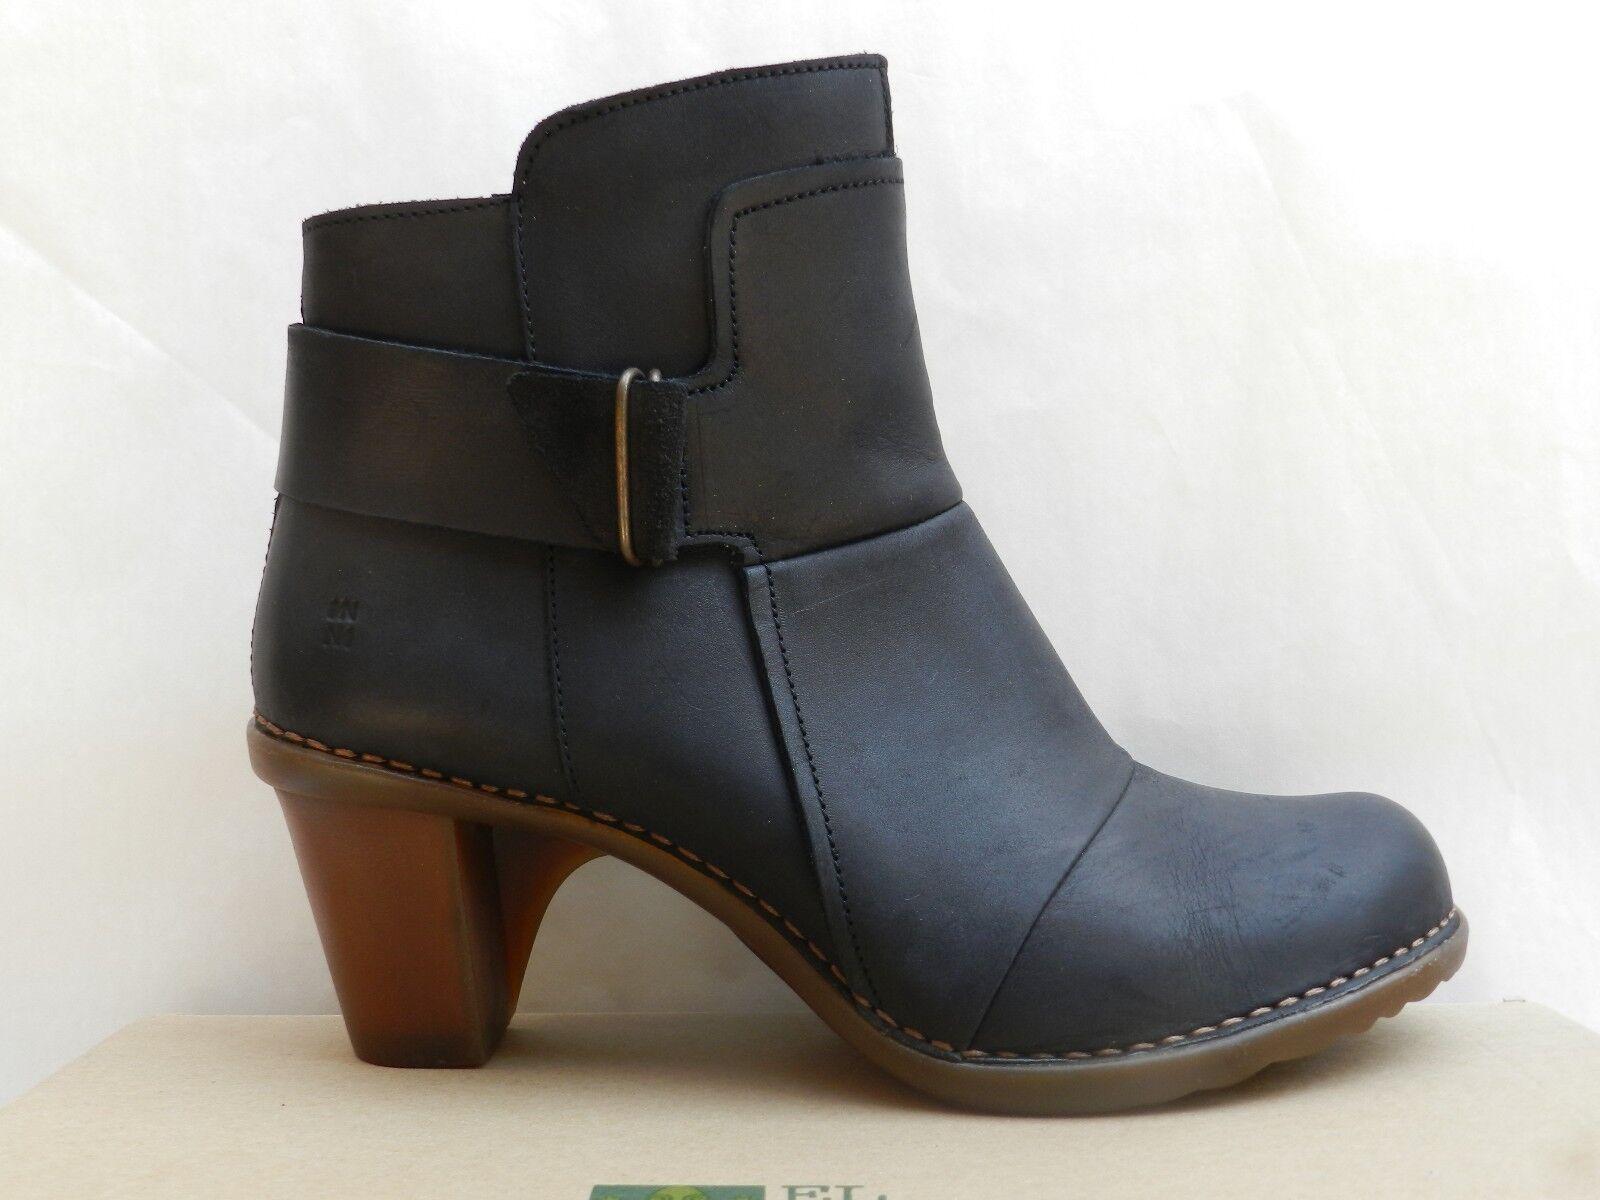 El Naturalista Duna N566 shoes Femme 42 Bottines Bottes 566 Compensé Neuf